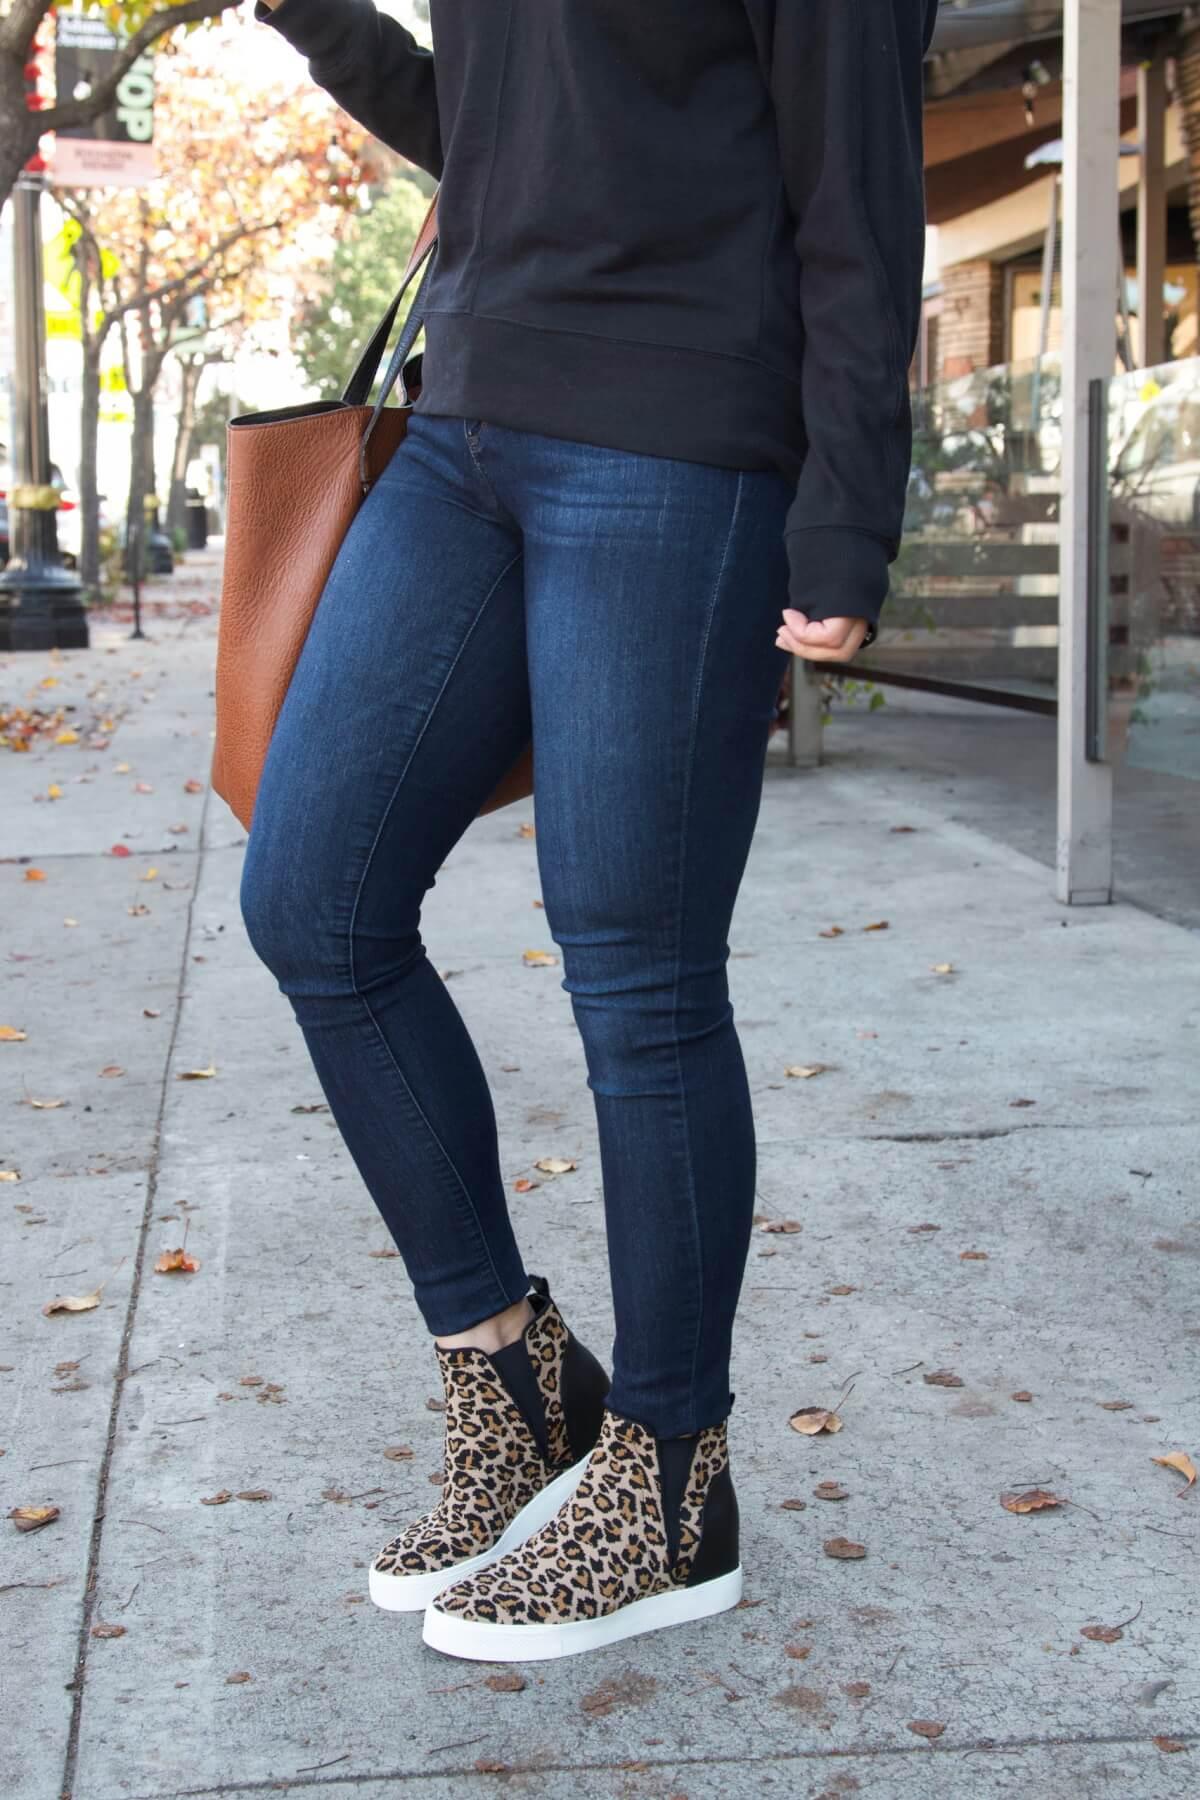 Black Sweatshirt, Skinny Jeans, Leopard Wedge Sneakers, Cognac Tote, and Tan Earrings Casual Outfit Bottom Half Side View 2